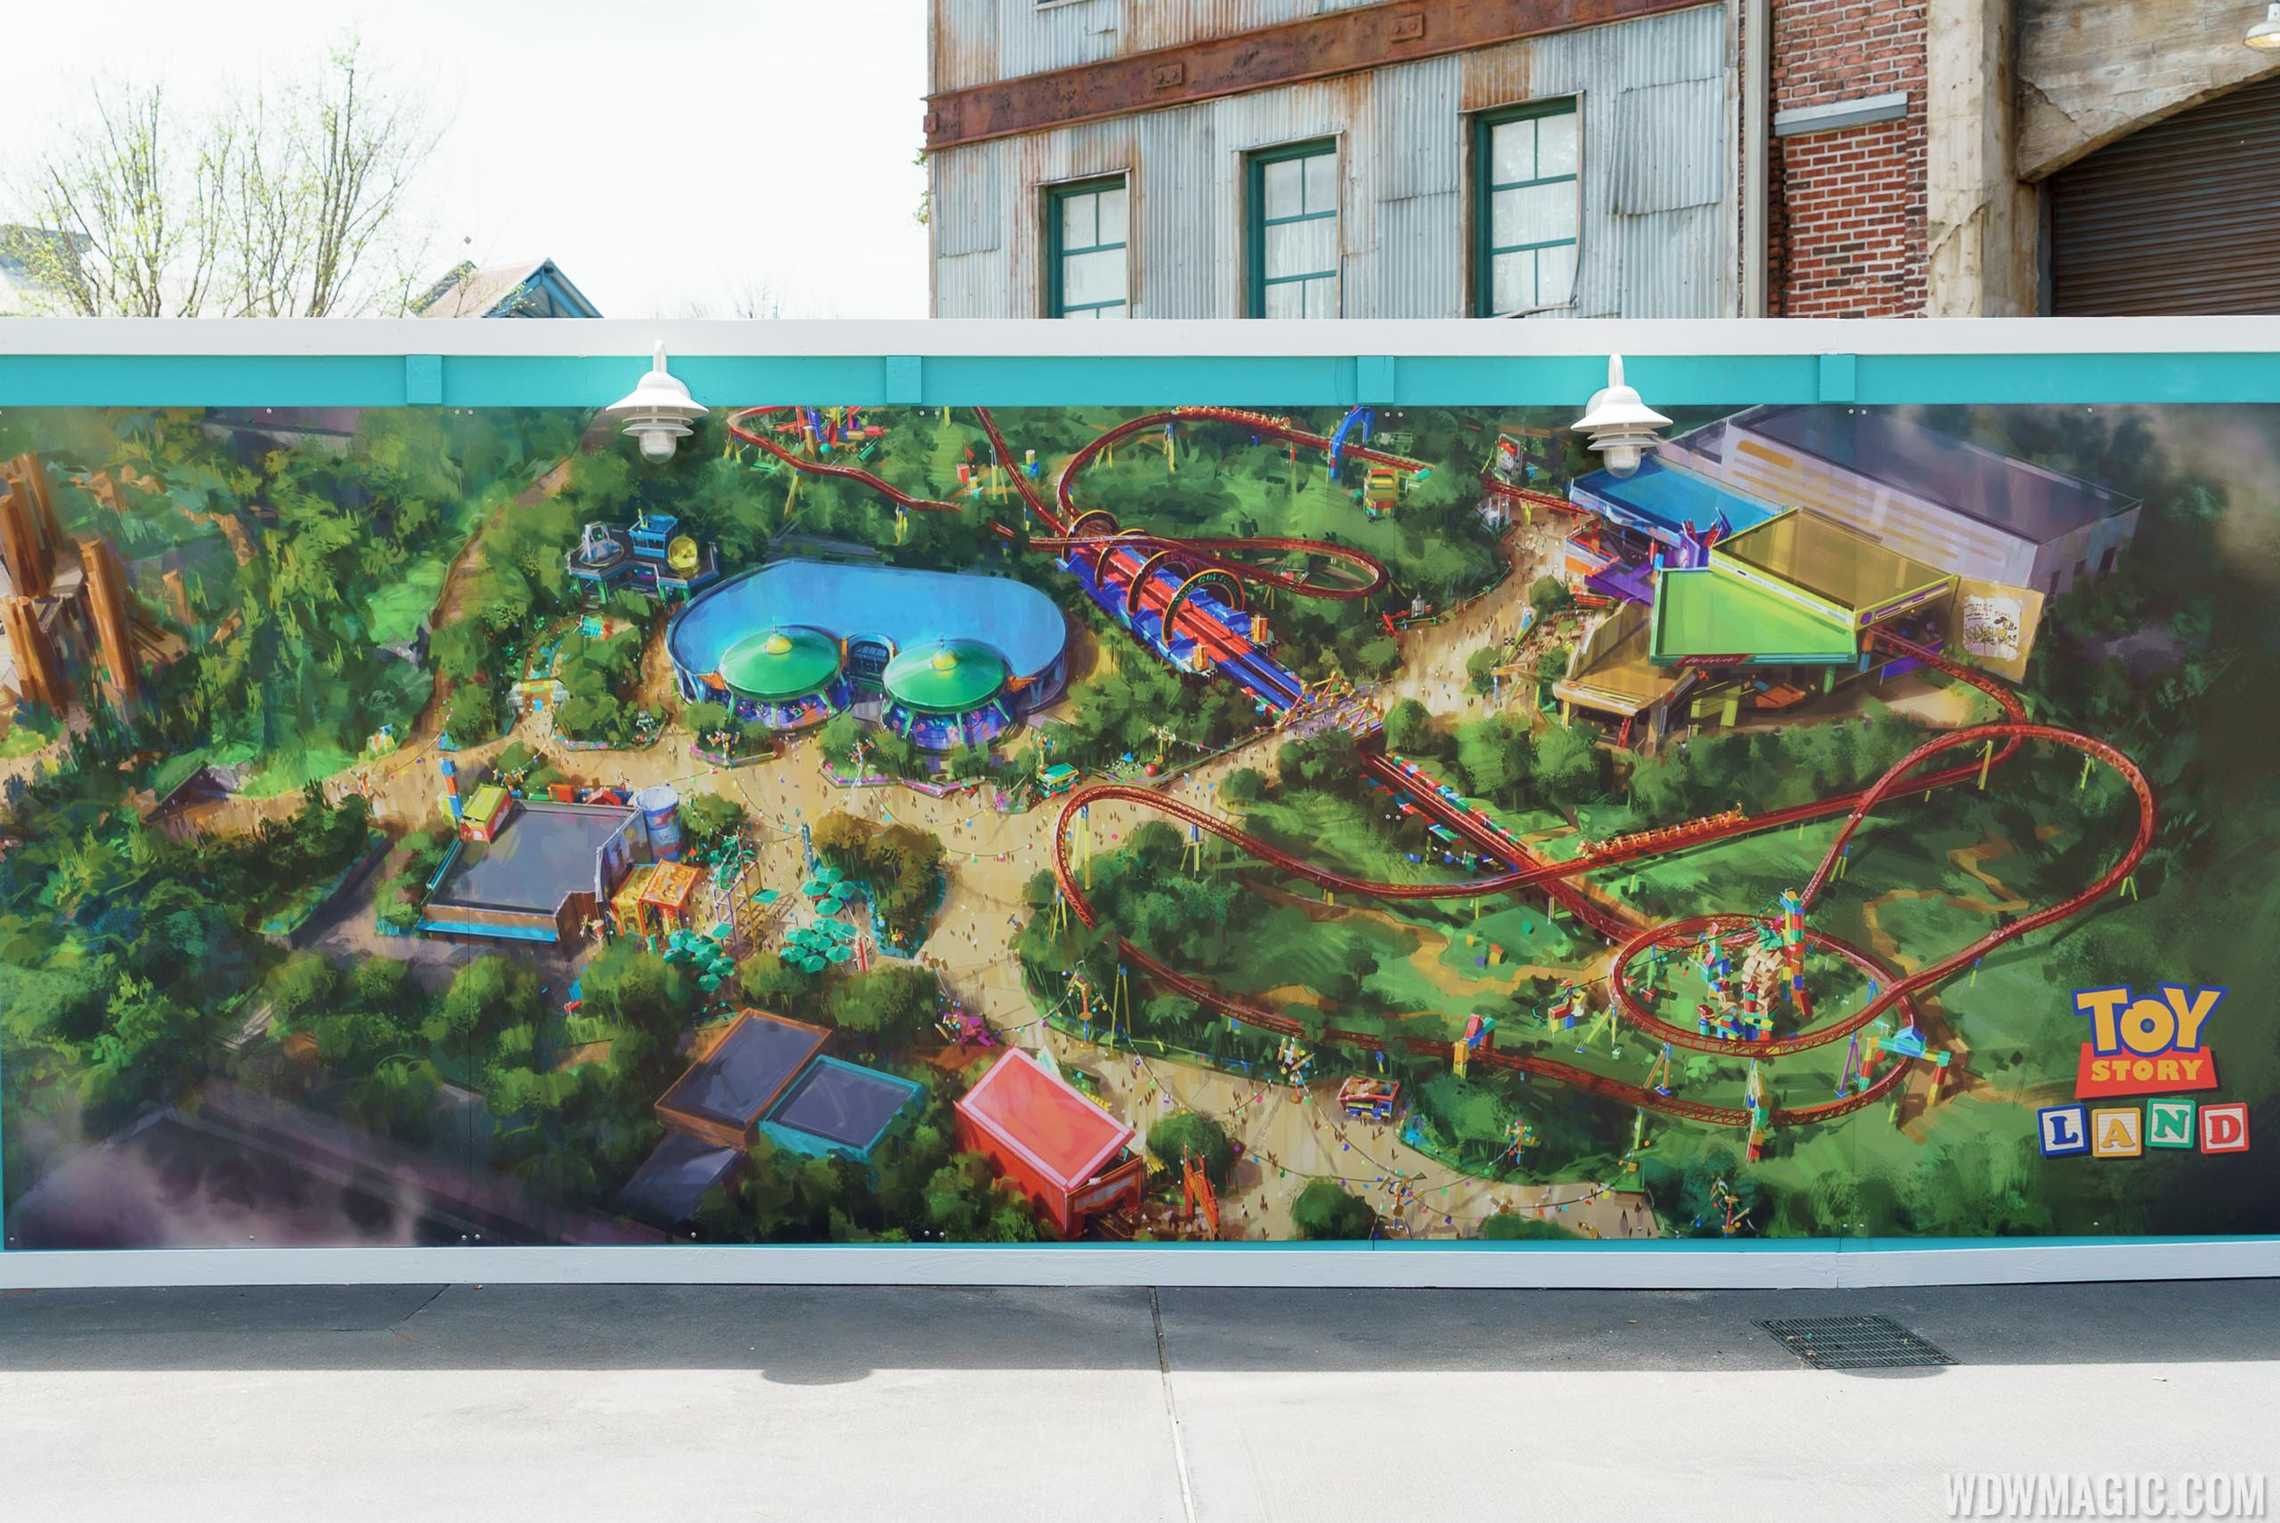 Toy Story Land concept art April 2016